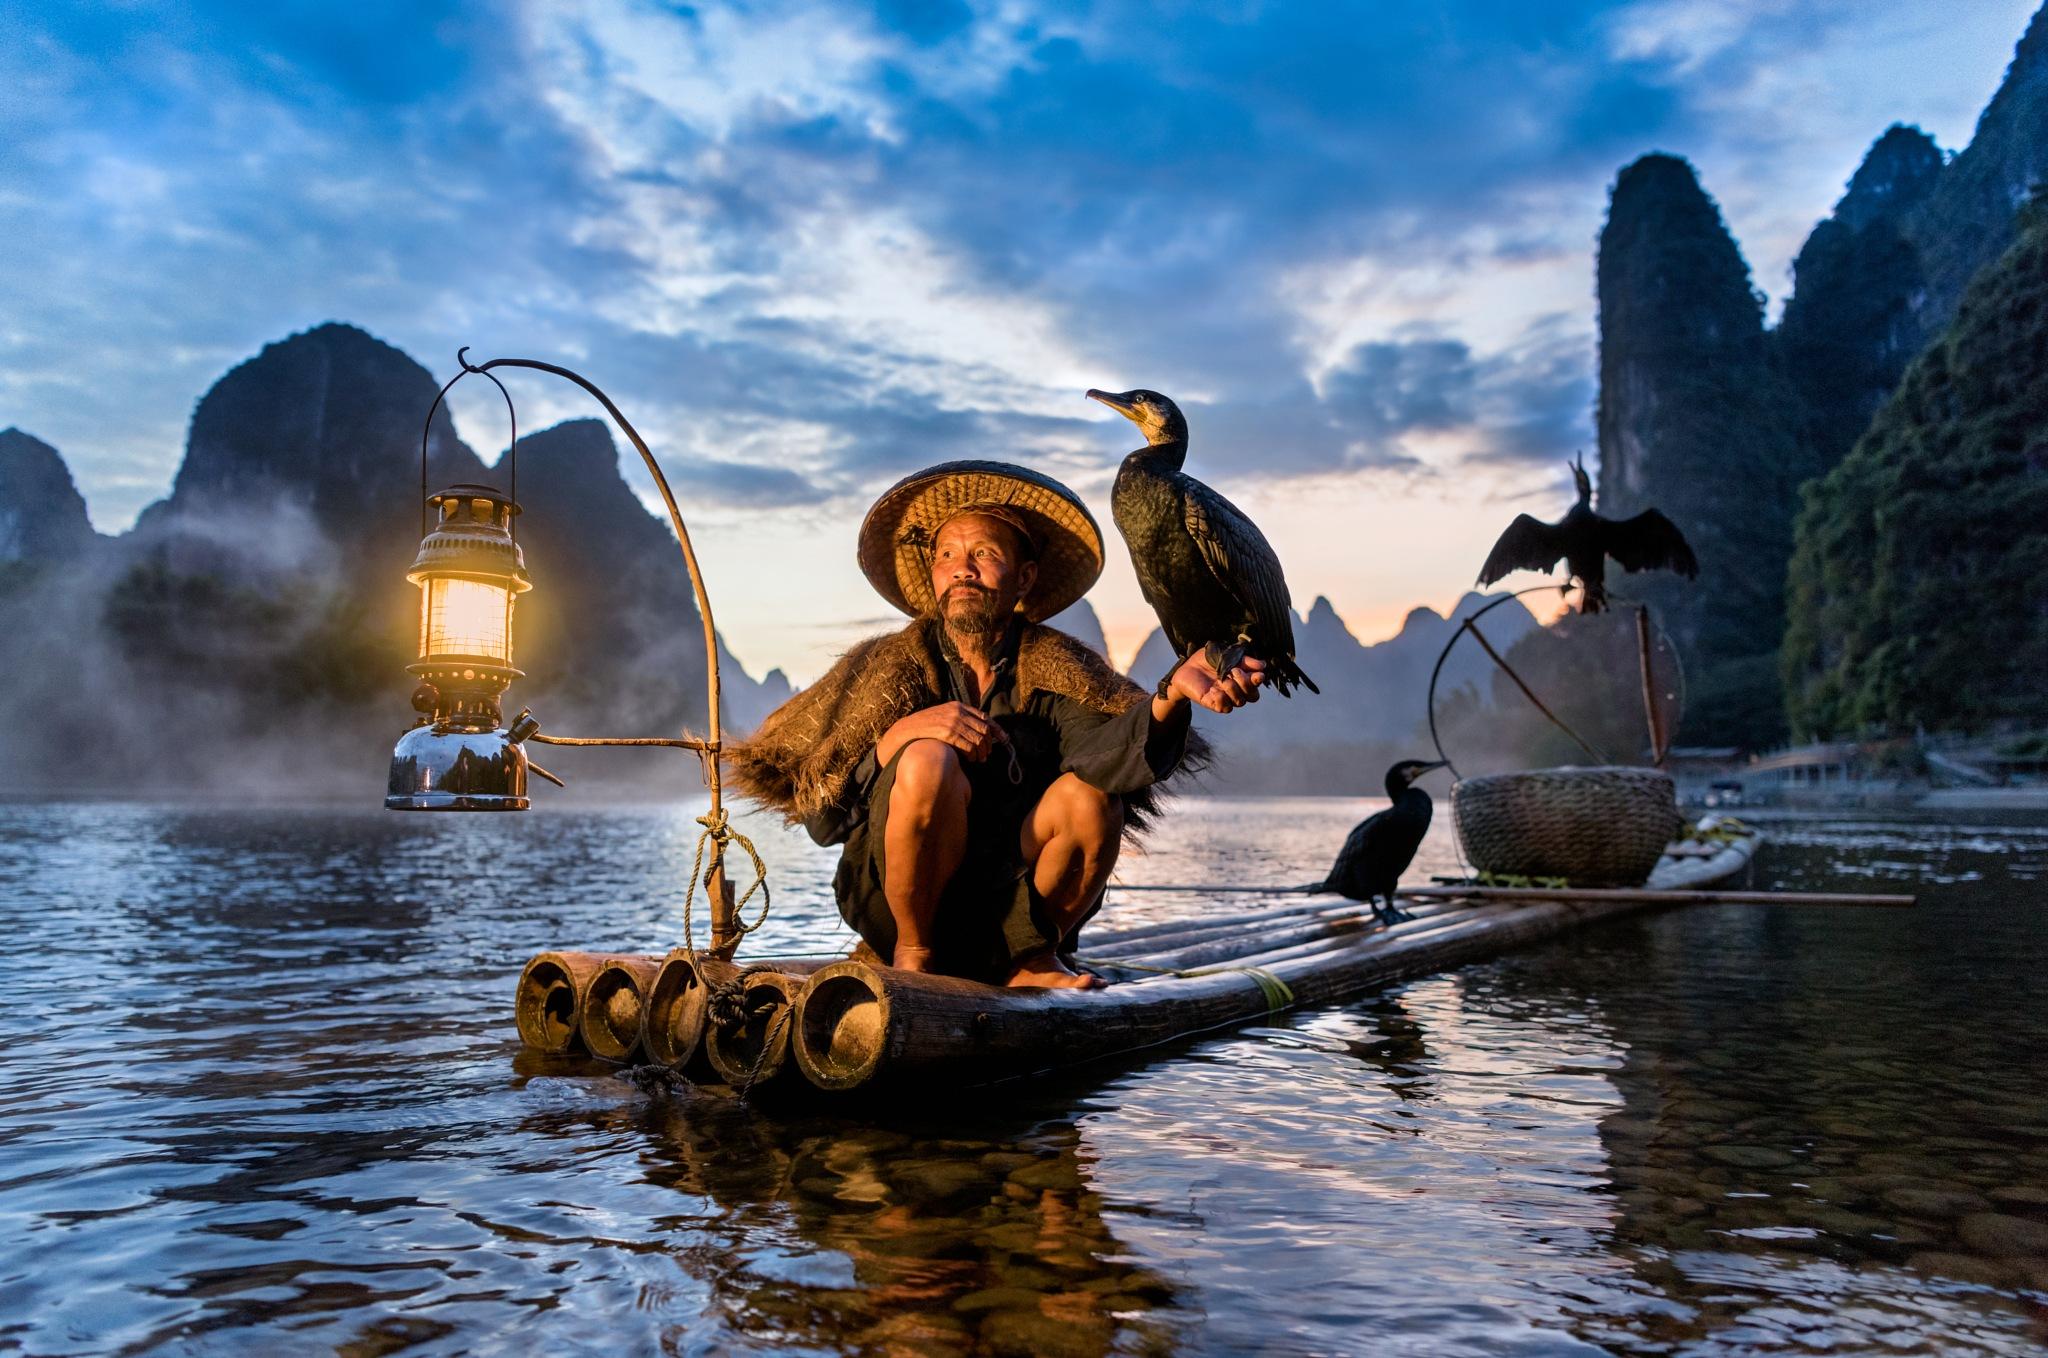 The Cormorant Fisherman by Robdigphot